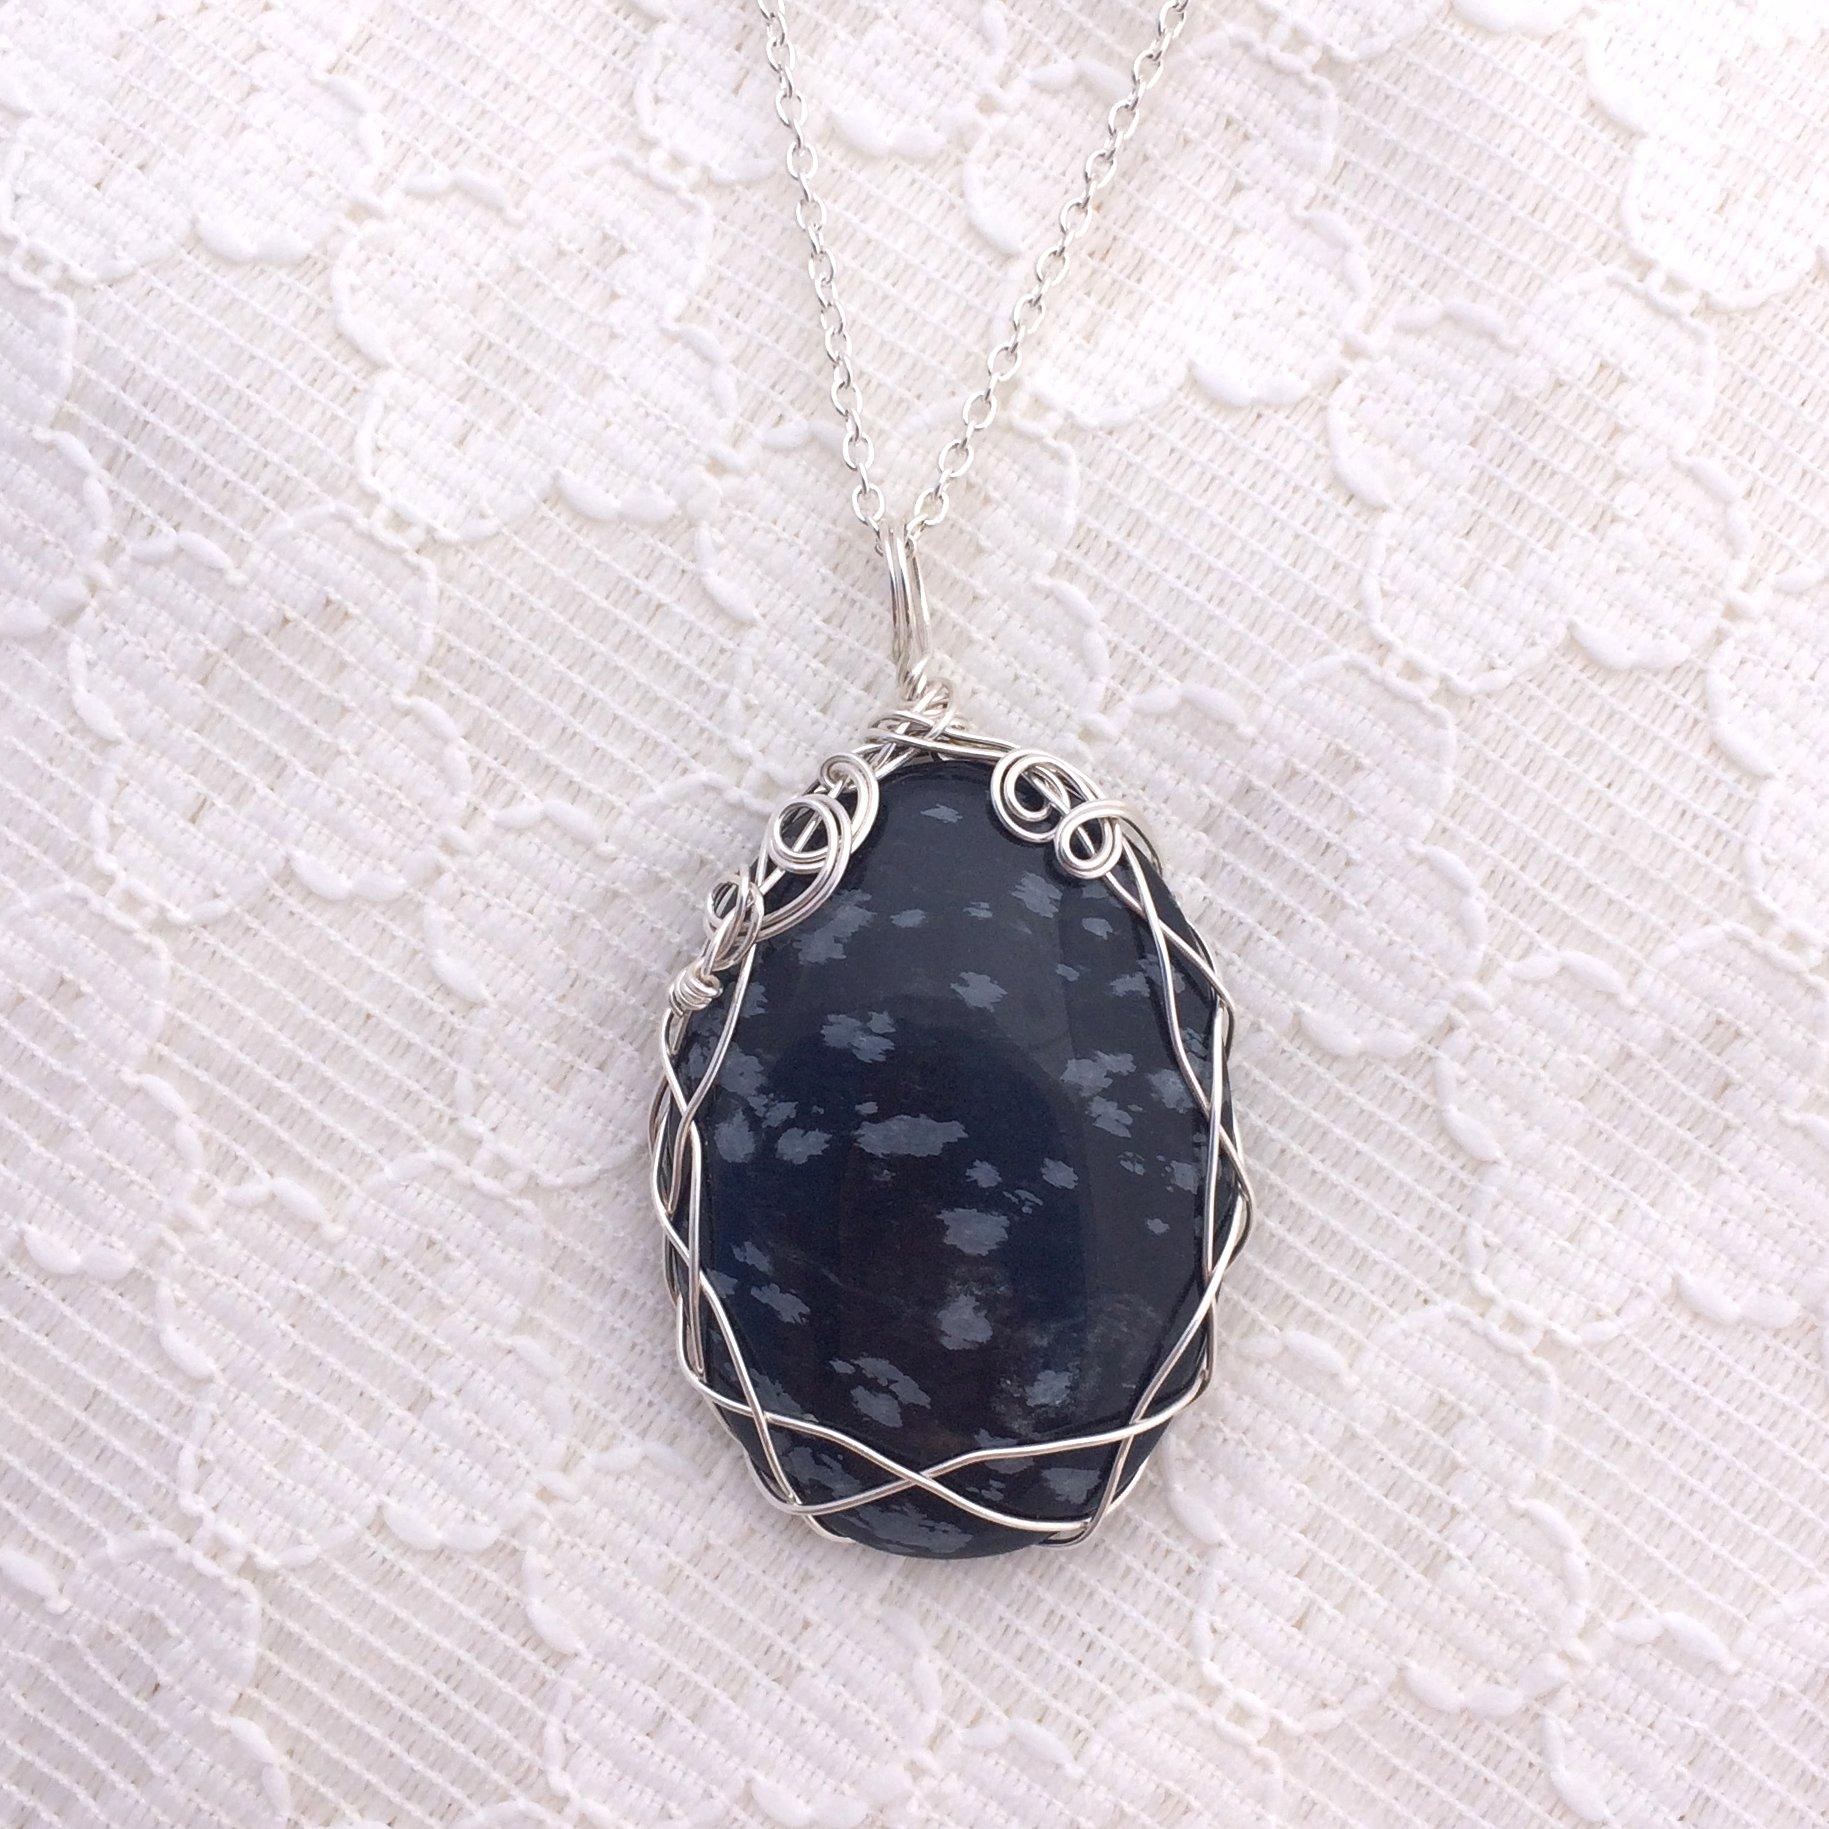 obsidian-pendant